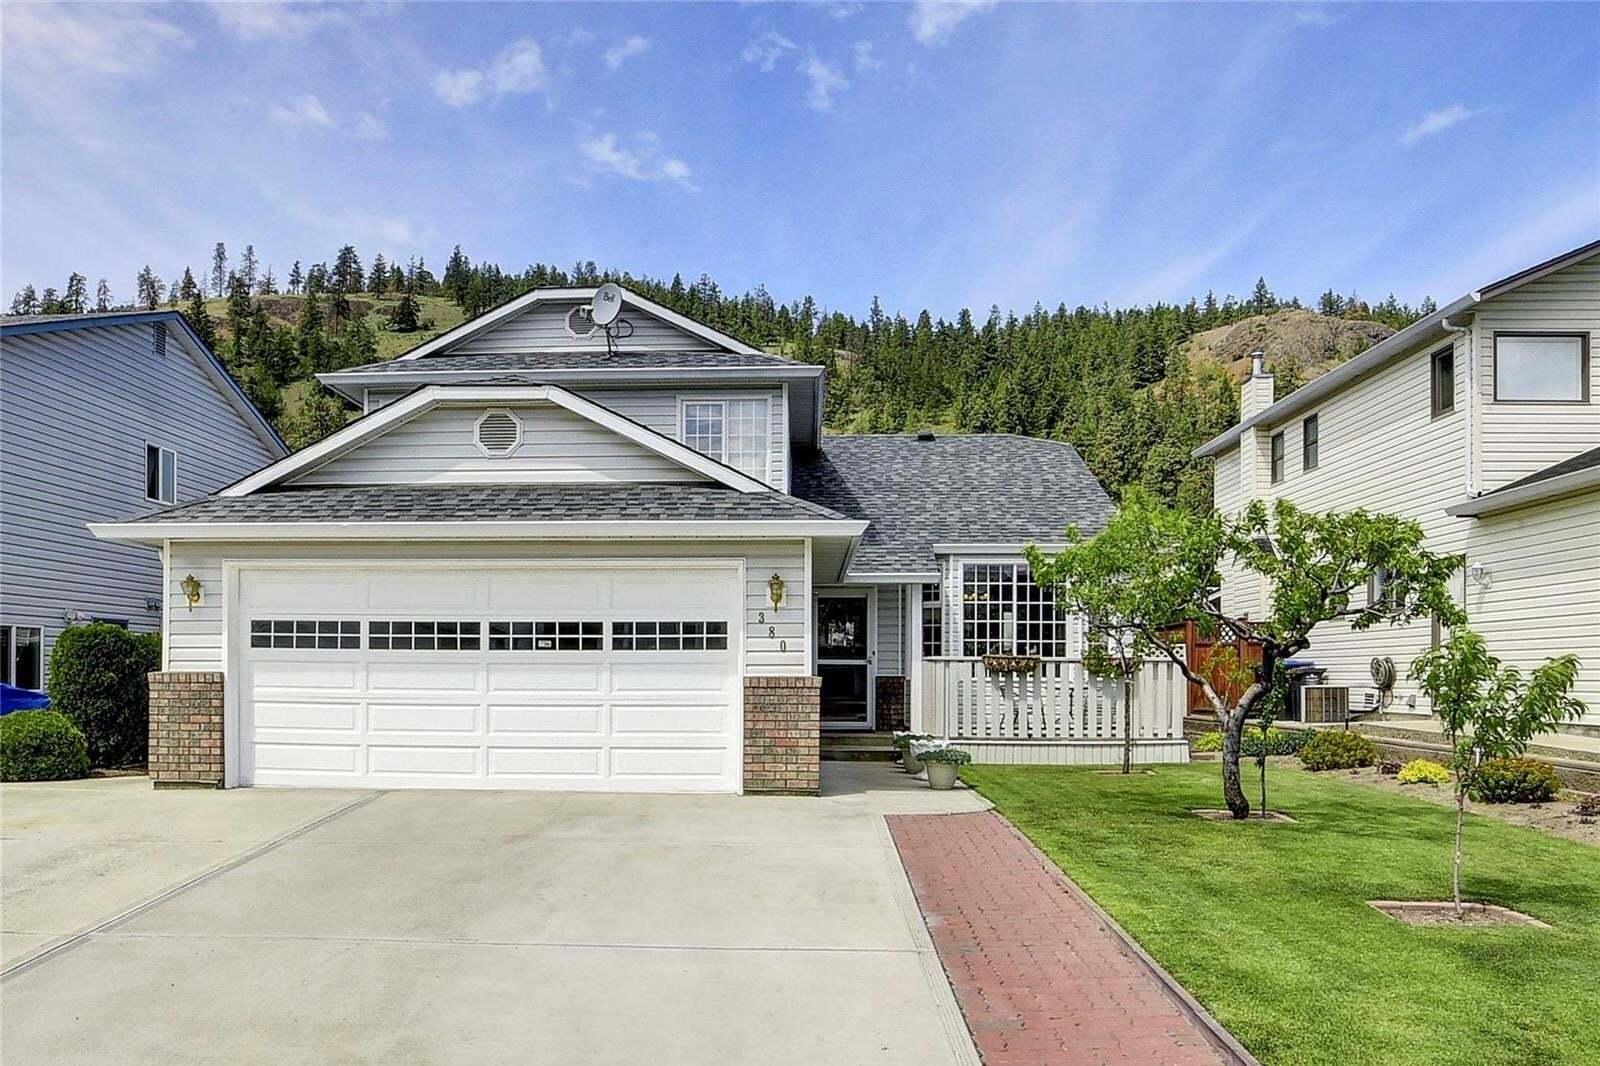 House for sale at 380 Mctavish Rd Kelowna British Columbia - MLS: 10204700